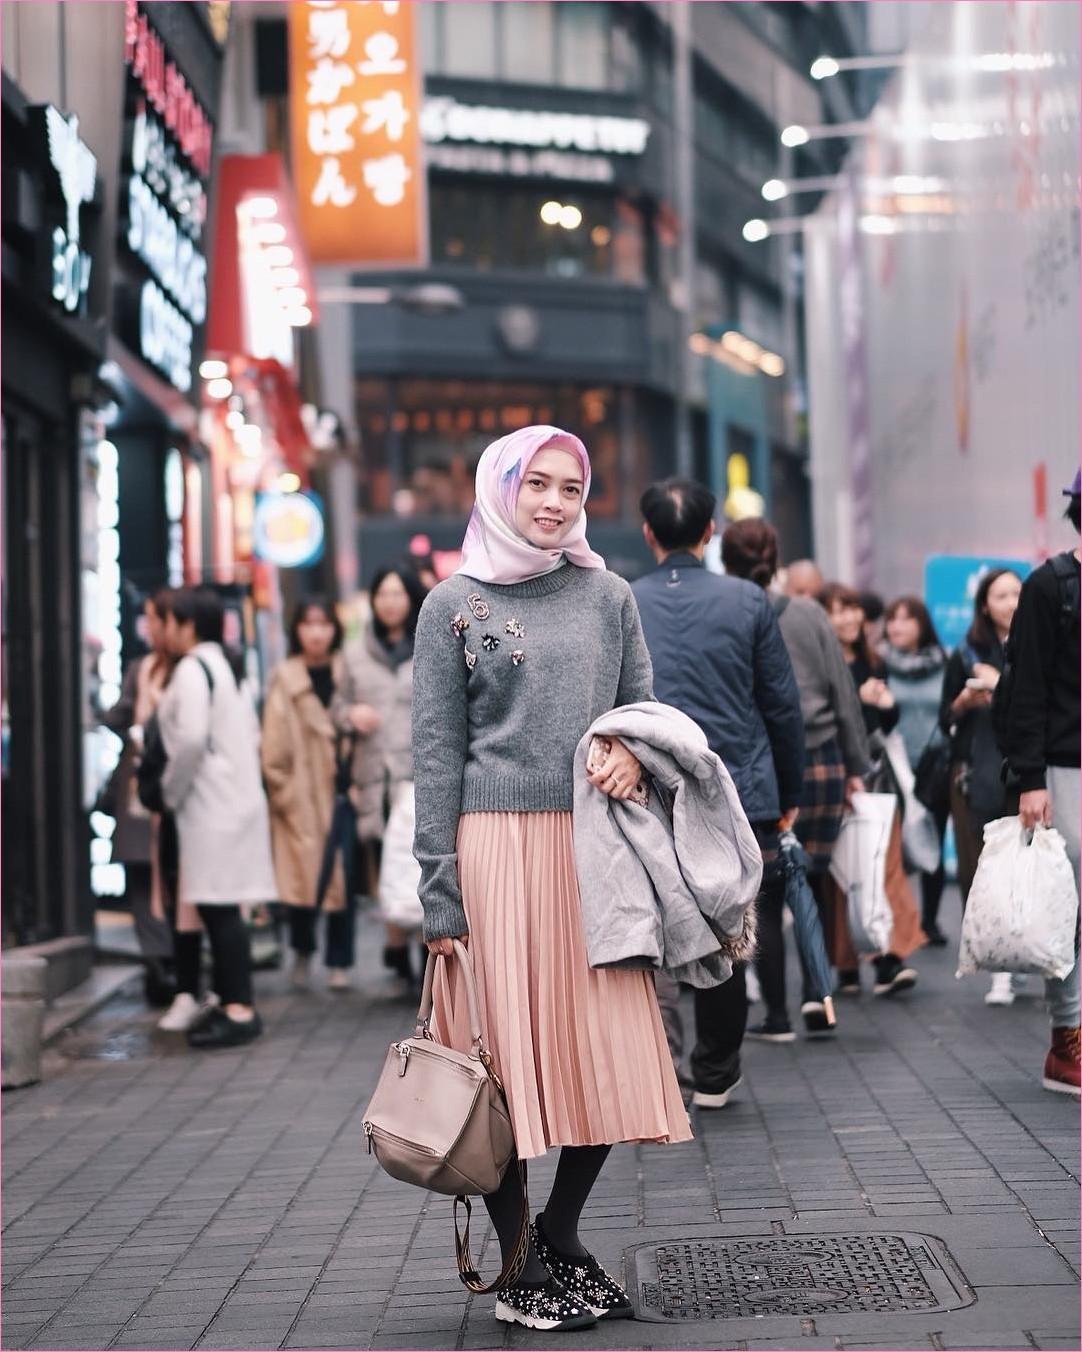 Outfit Baju Traveler Berhijab untuk Keluar Negri Ala Selebgram 2018 handbags coklat muda jacket sweater abu rok oren muda segiempat square hijab pink ciput rajut stocking lace ups flatshoes hitam ootd outfit trendy terbaru coat